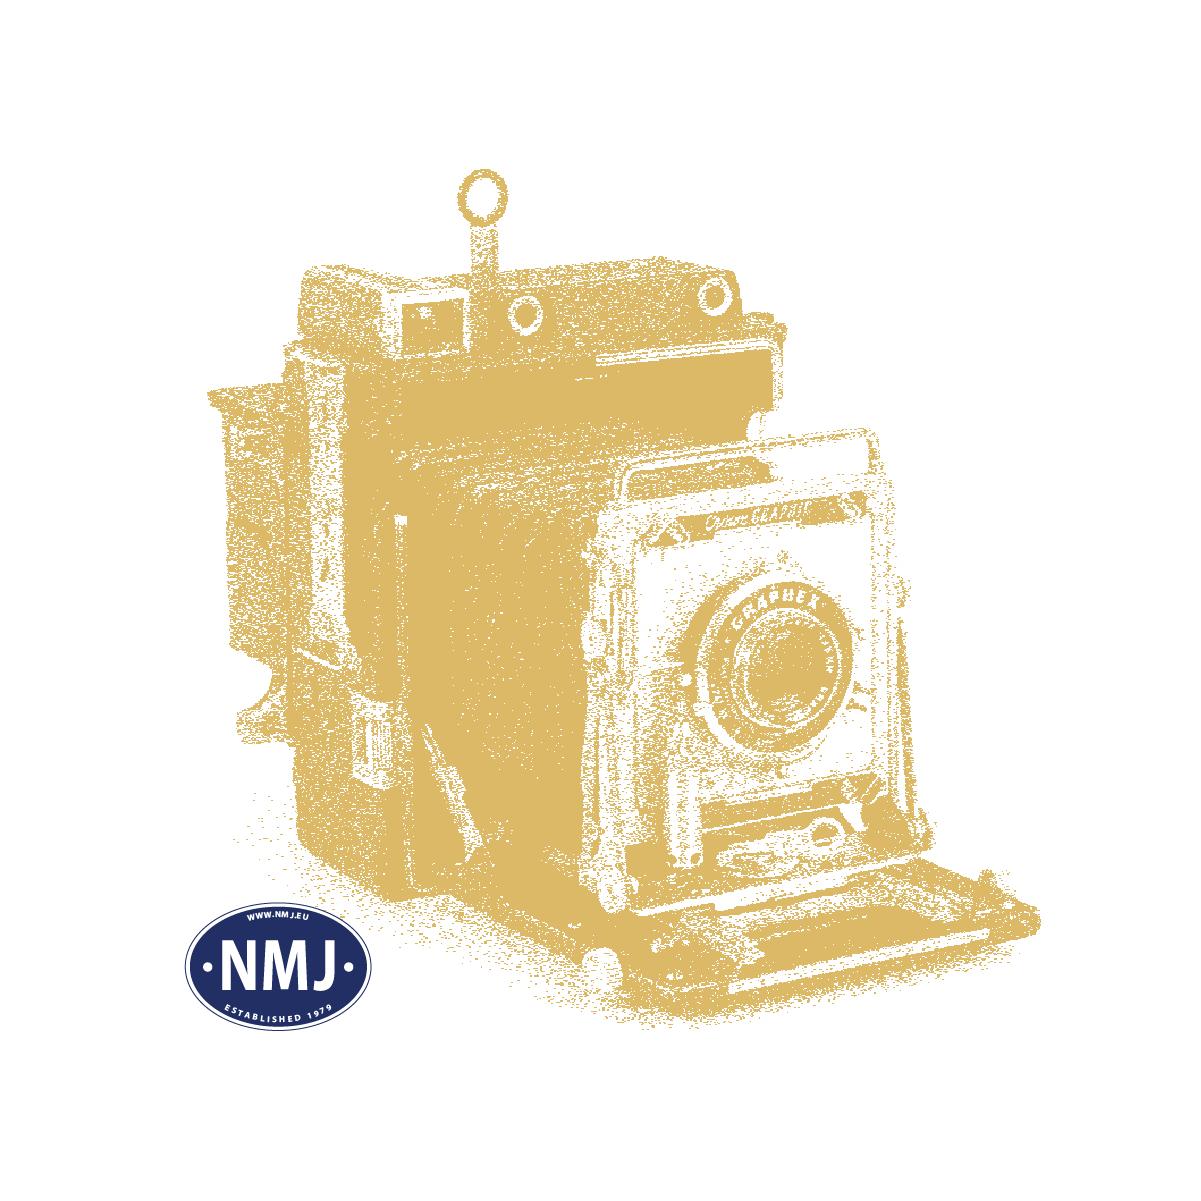 NMJS Elo 0328-5 - NMJ Superline NSB Elo 21 76 511 0328-5, m/ Bremseplattform